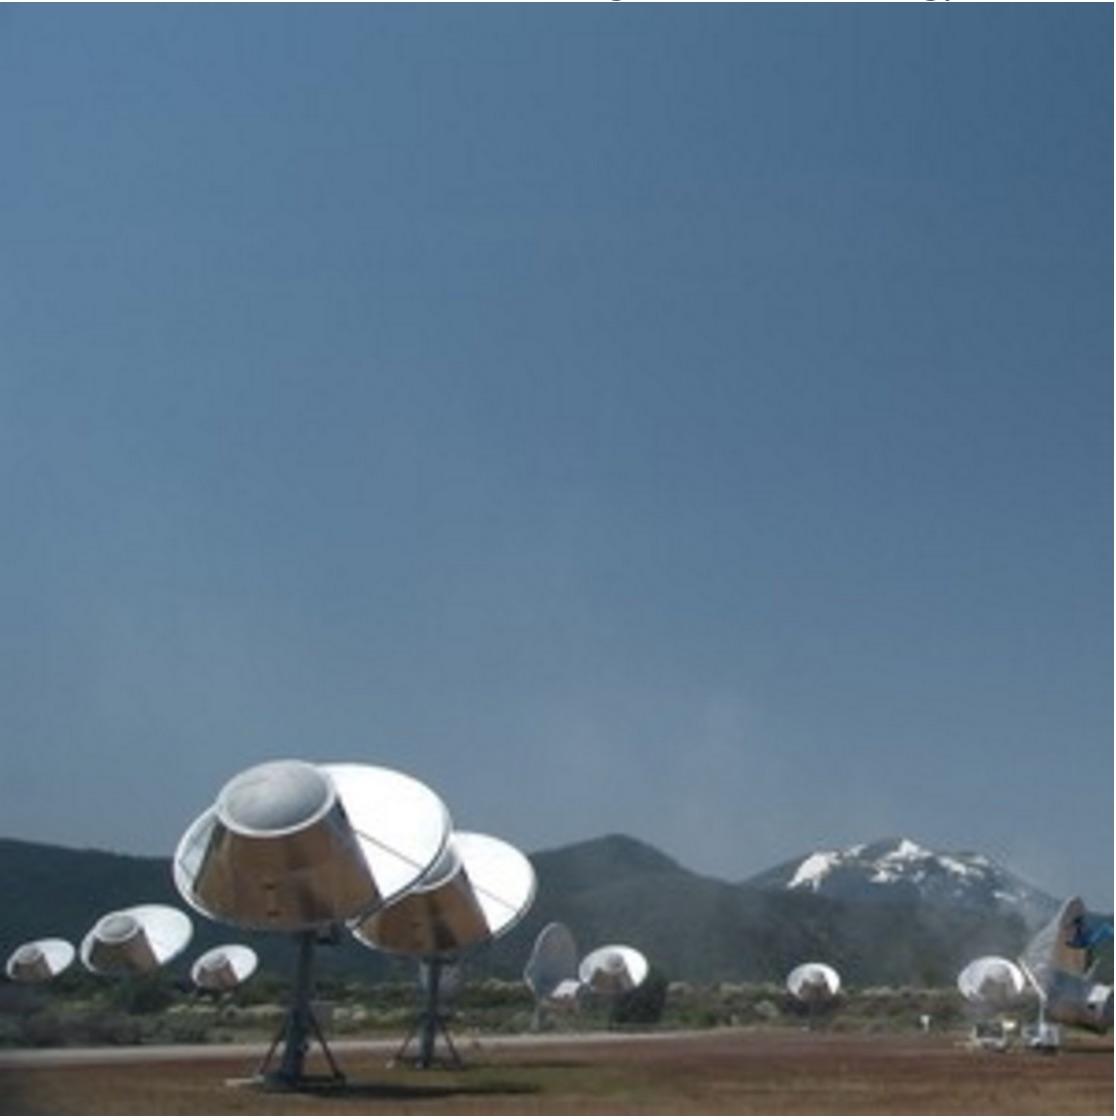 SETI Seeks Ideas to Hunt Strange Alien Lifeforms